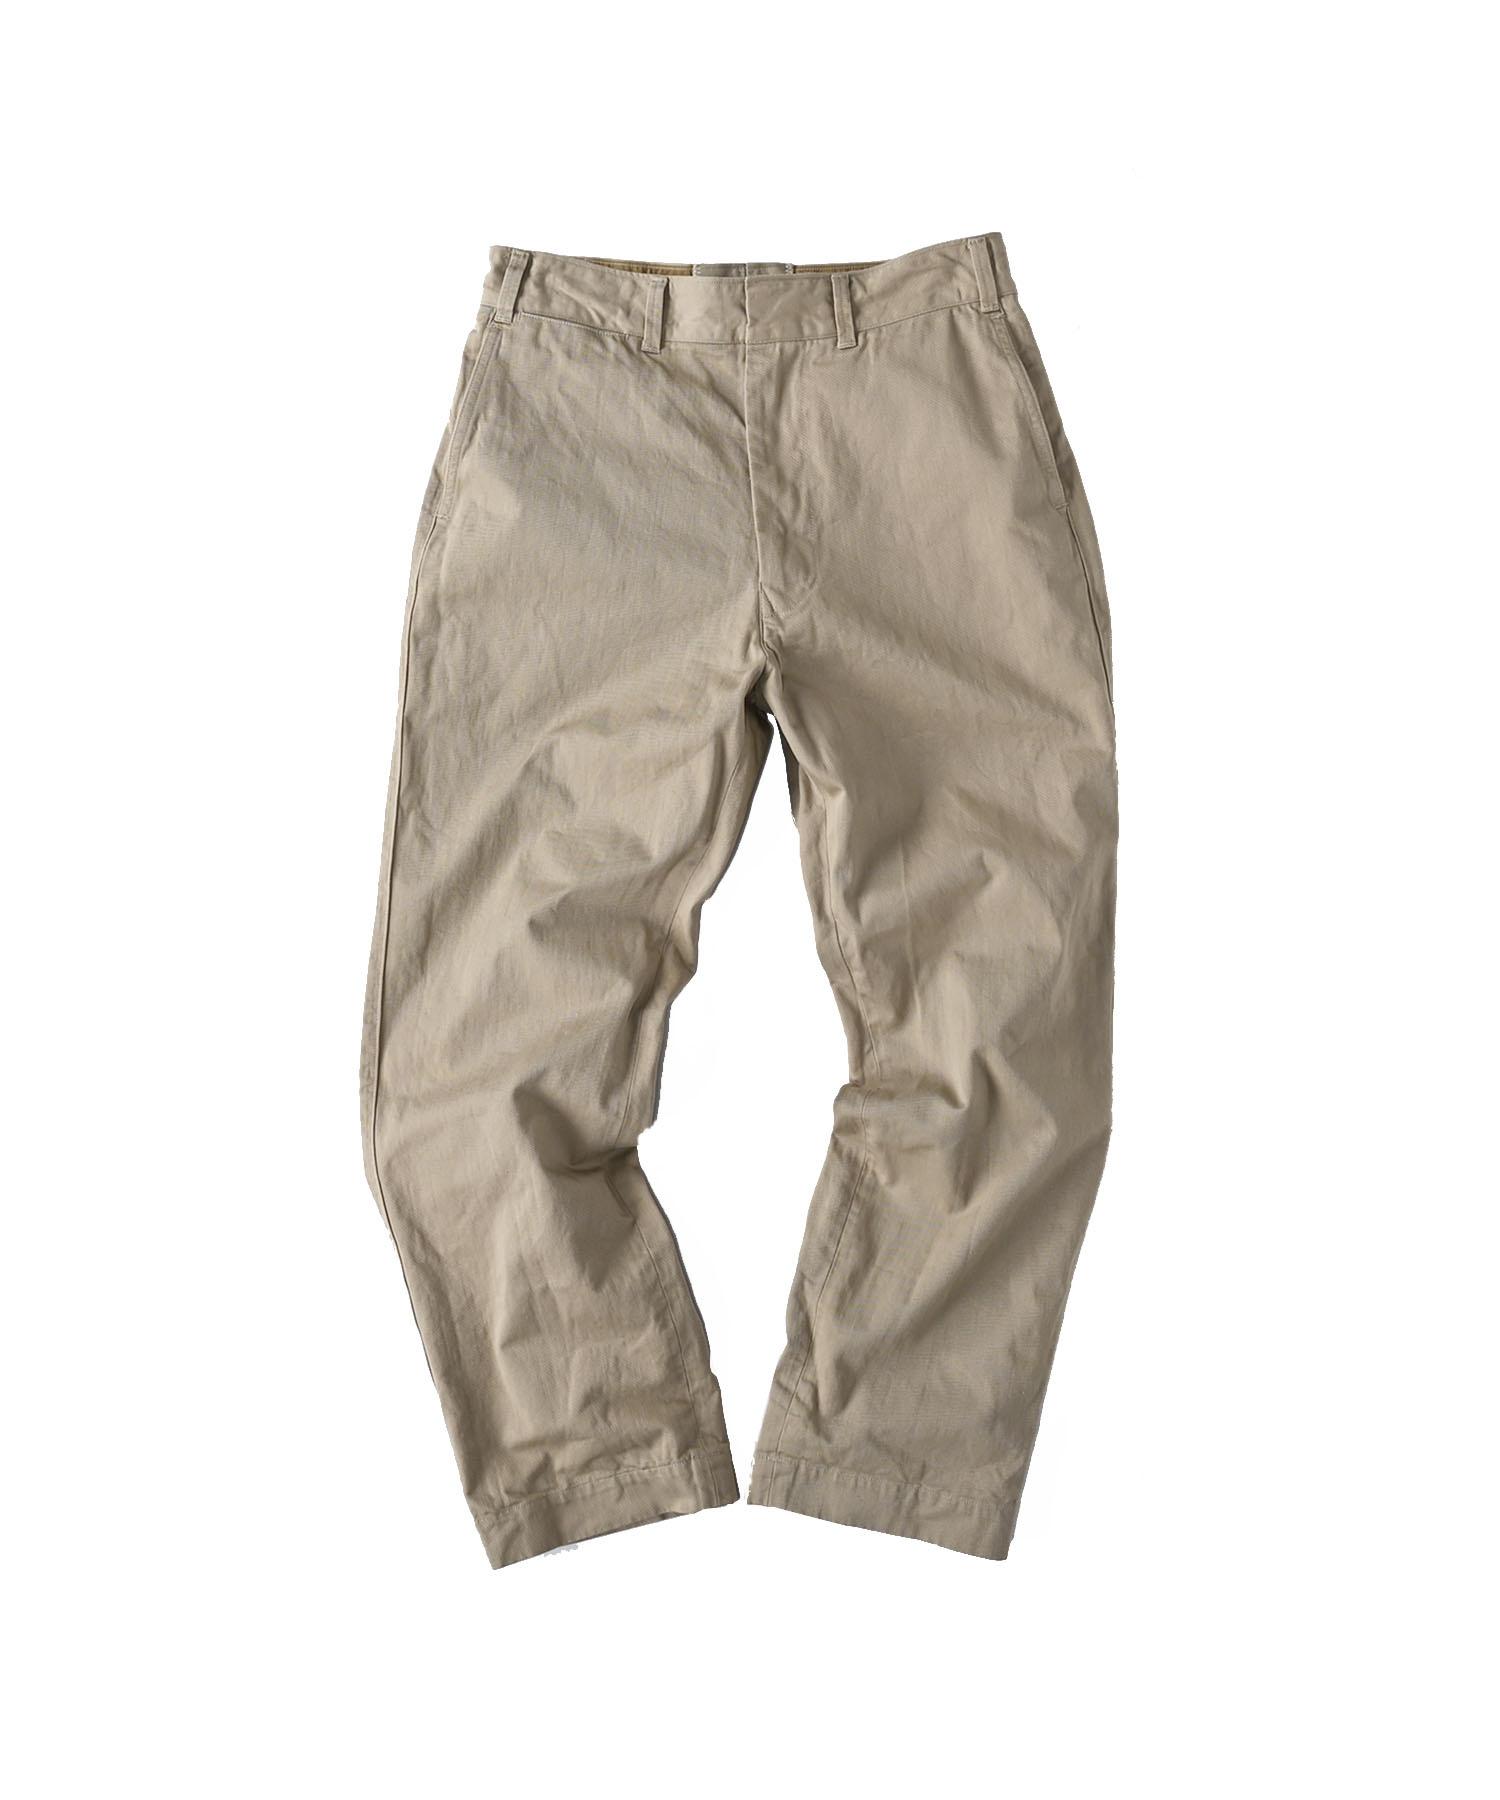 Okome Chino 908 Pants (0421)-1